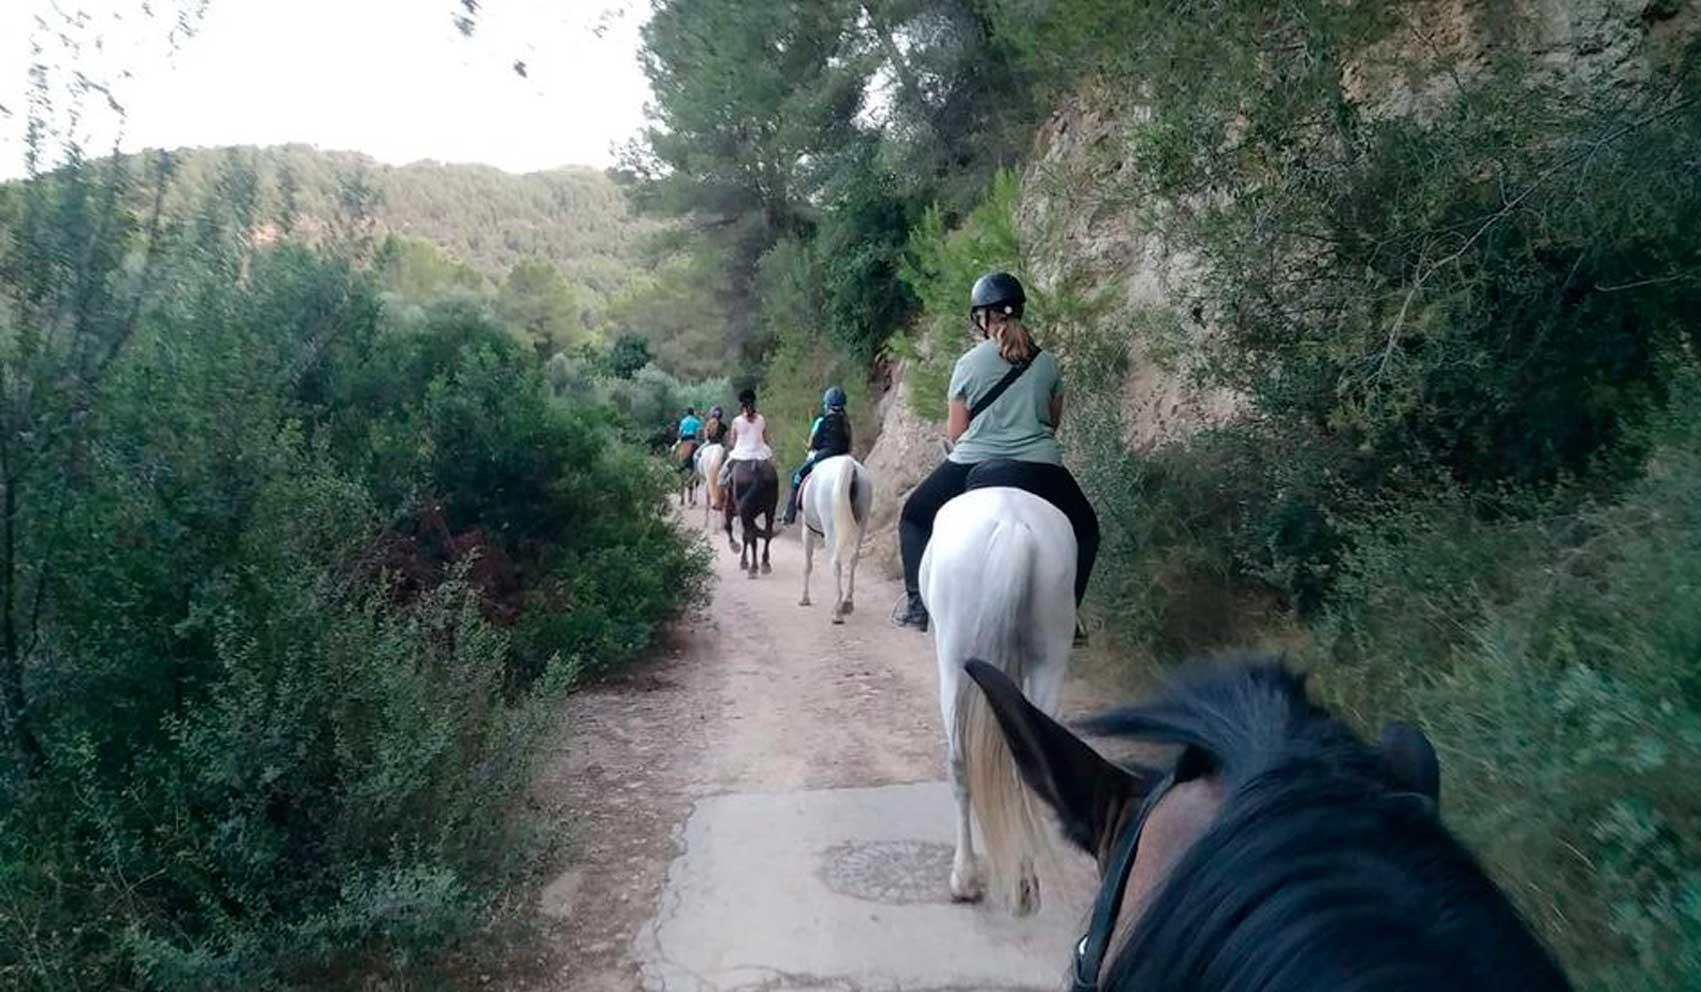 grupo de gente a caballo